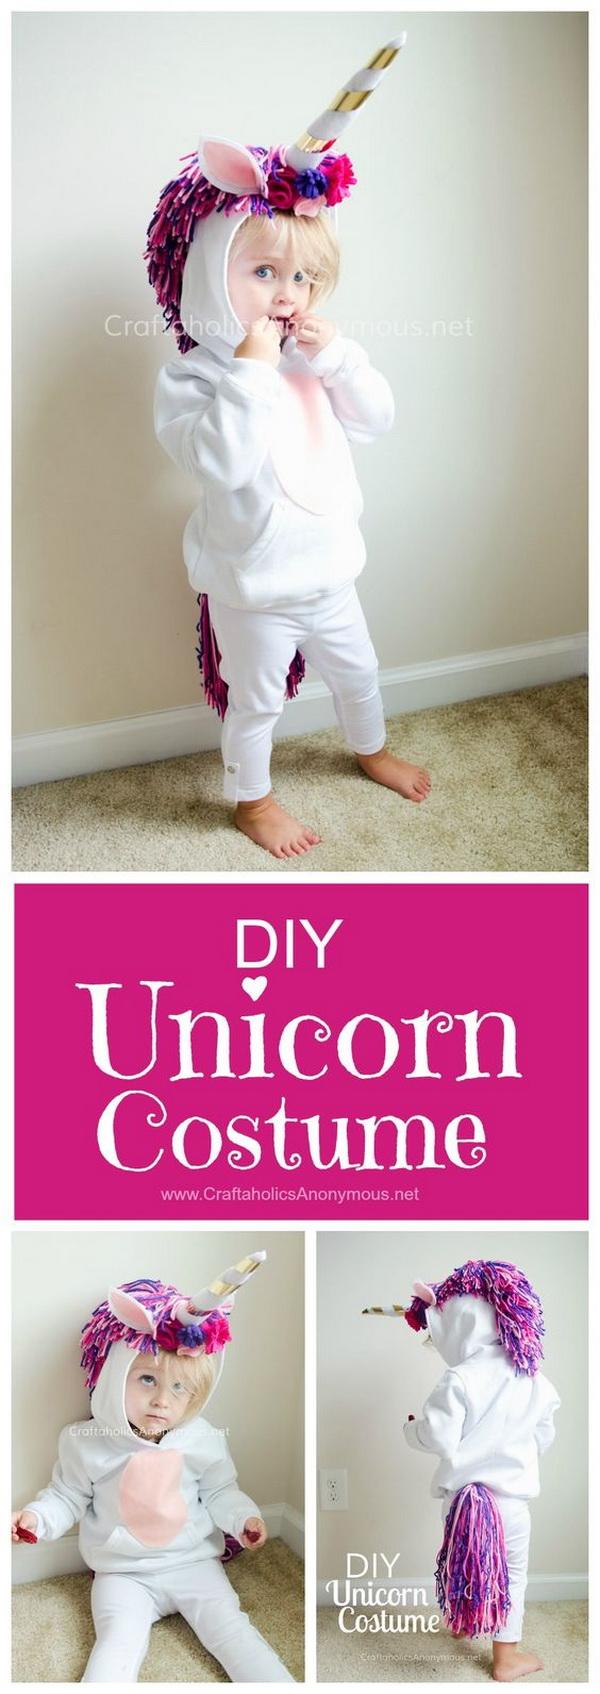 1 DIY Unicorn Costume for Kids